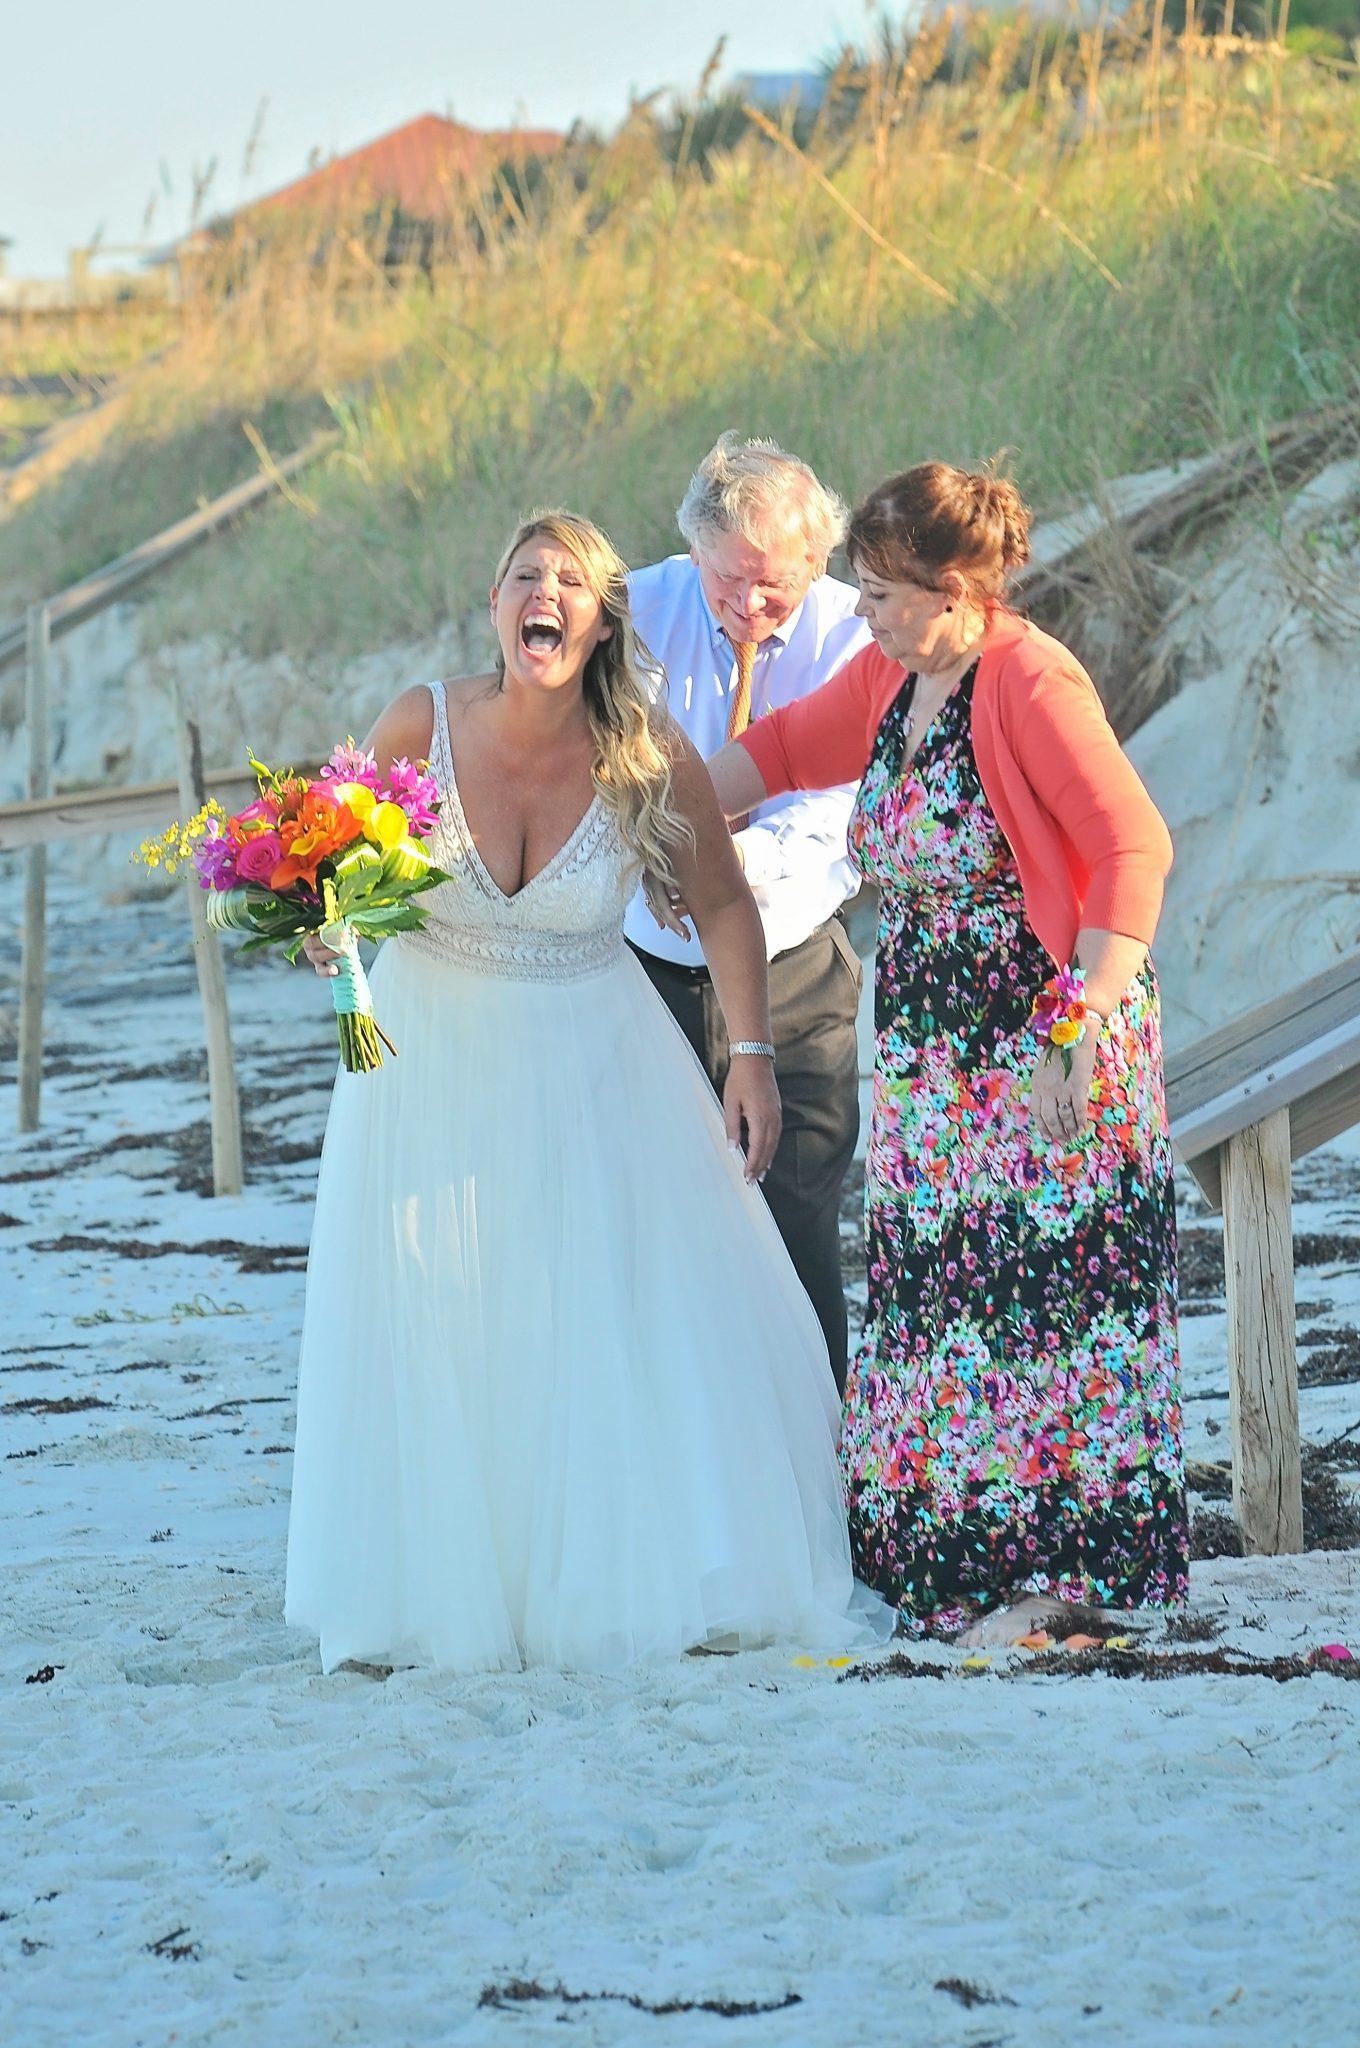 New Smyrna Beach Destination wedding